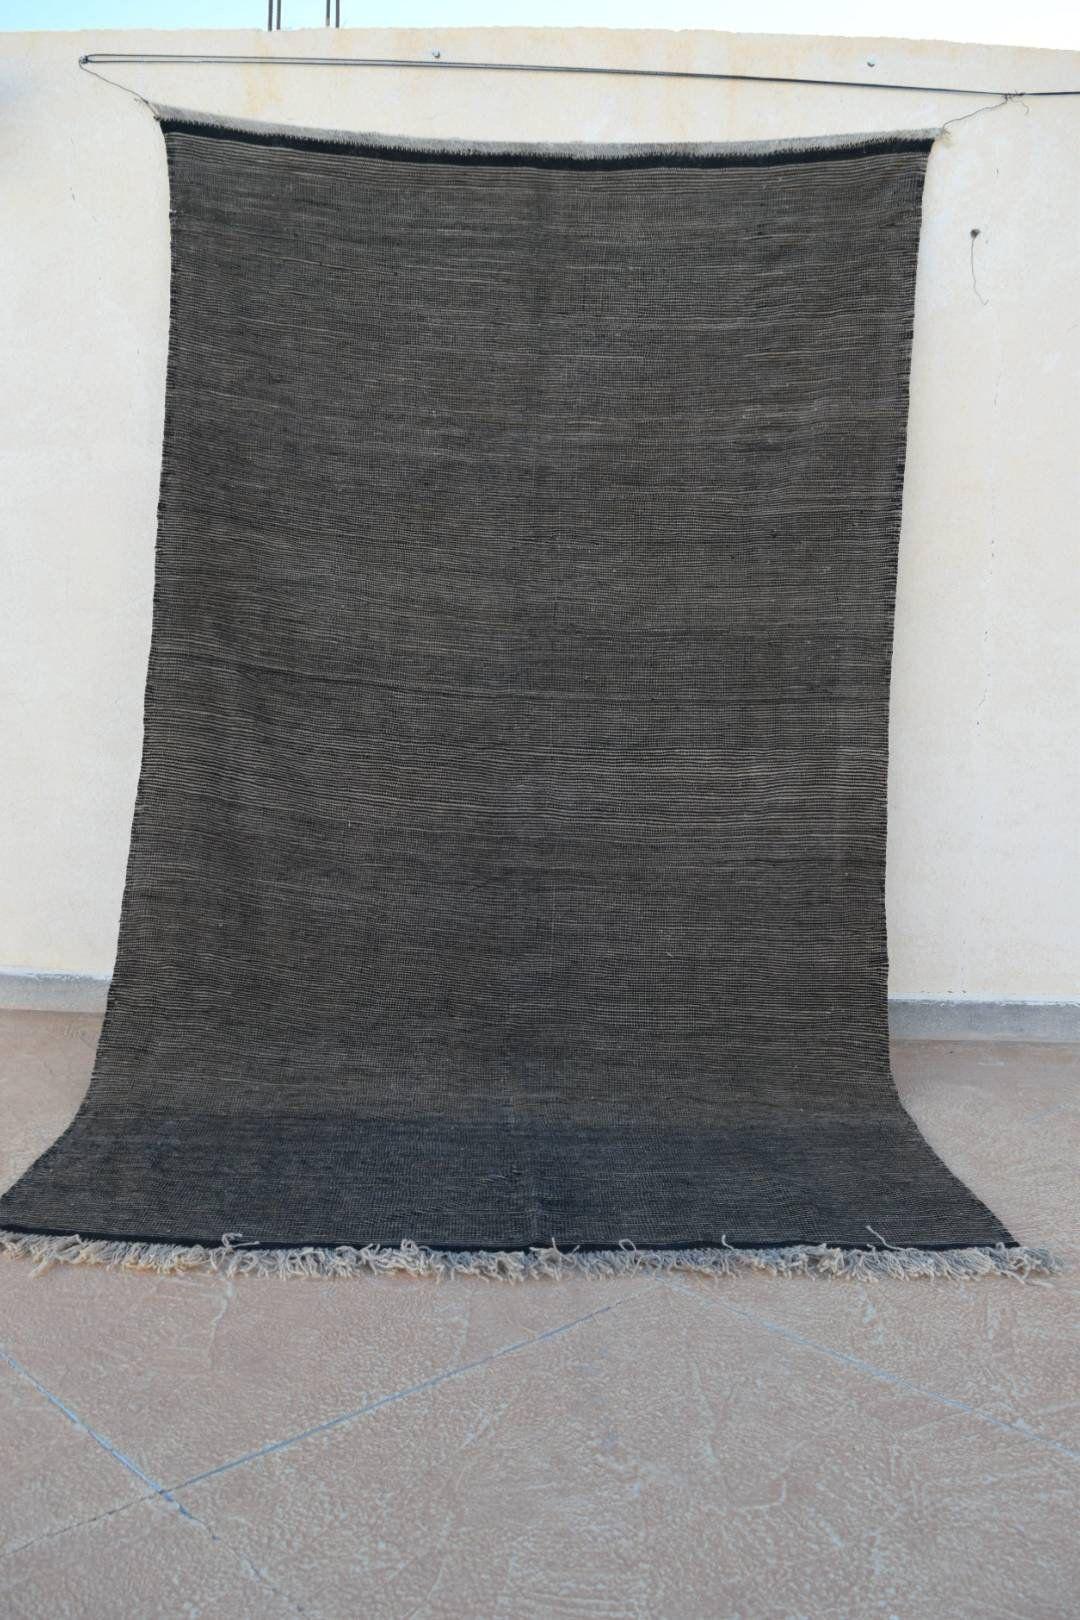 Zanafi Berber Rug Black White Kilim Moroccan Of Anti Atlas Gray Area 5x8 By Berberliving On Etsy